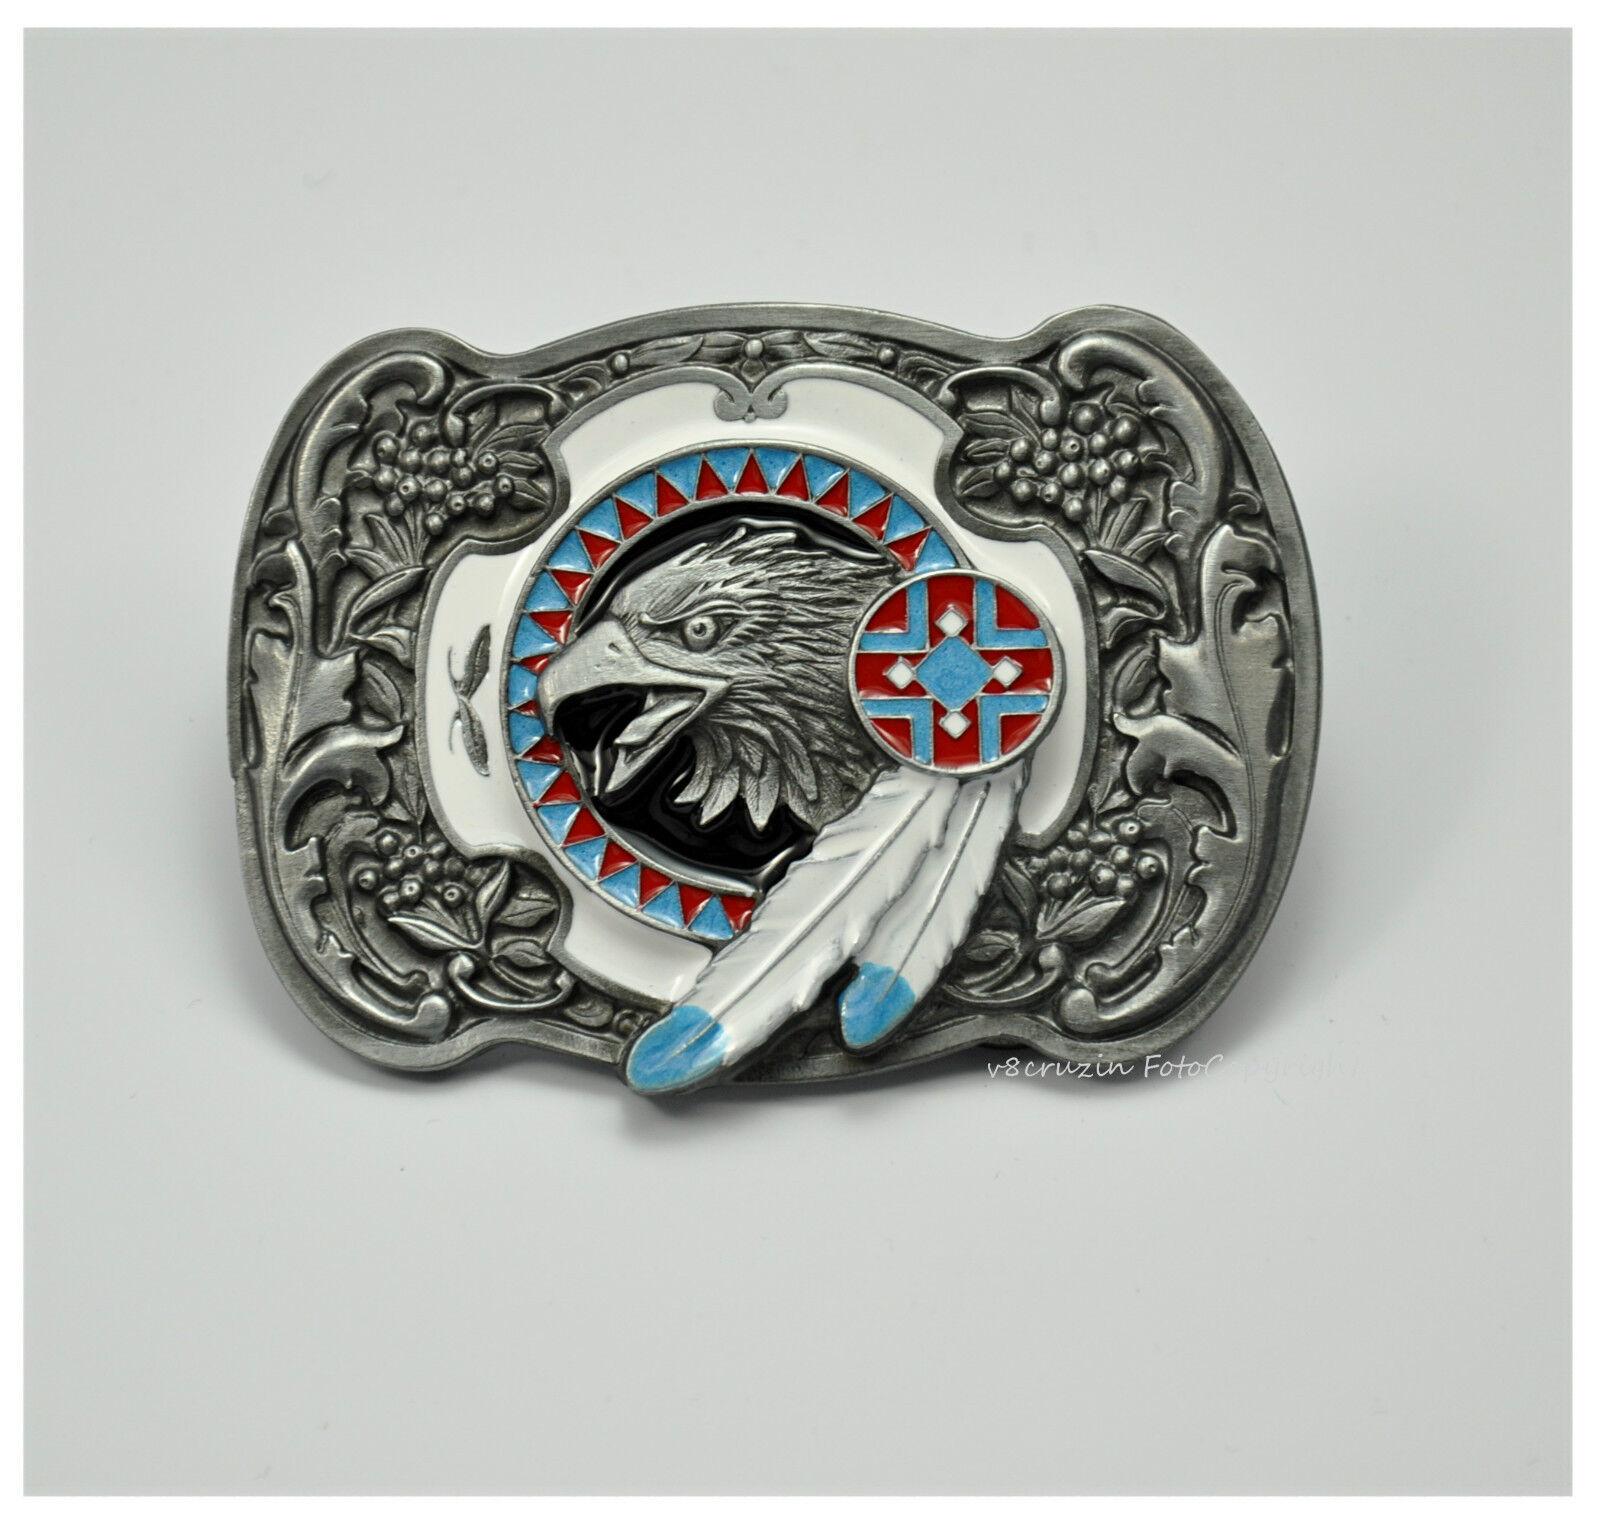 Adler Gürtelschnalle Western Indianer Cowboy Line Dance Belt Buckle *590